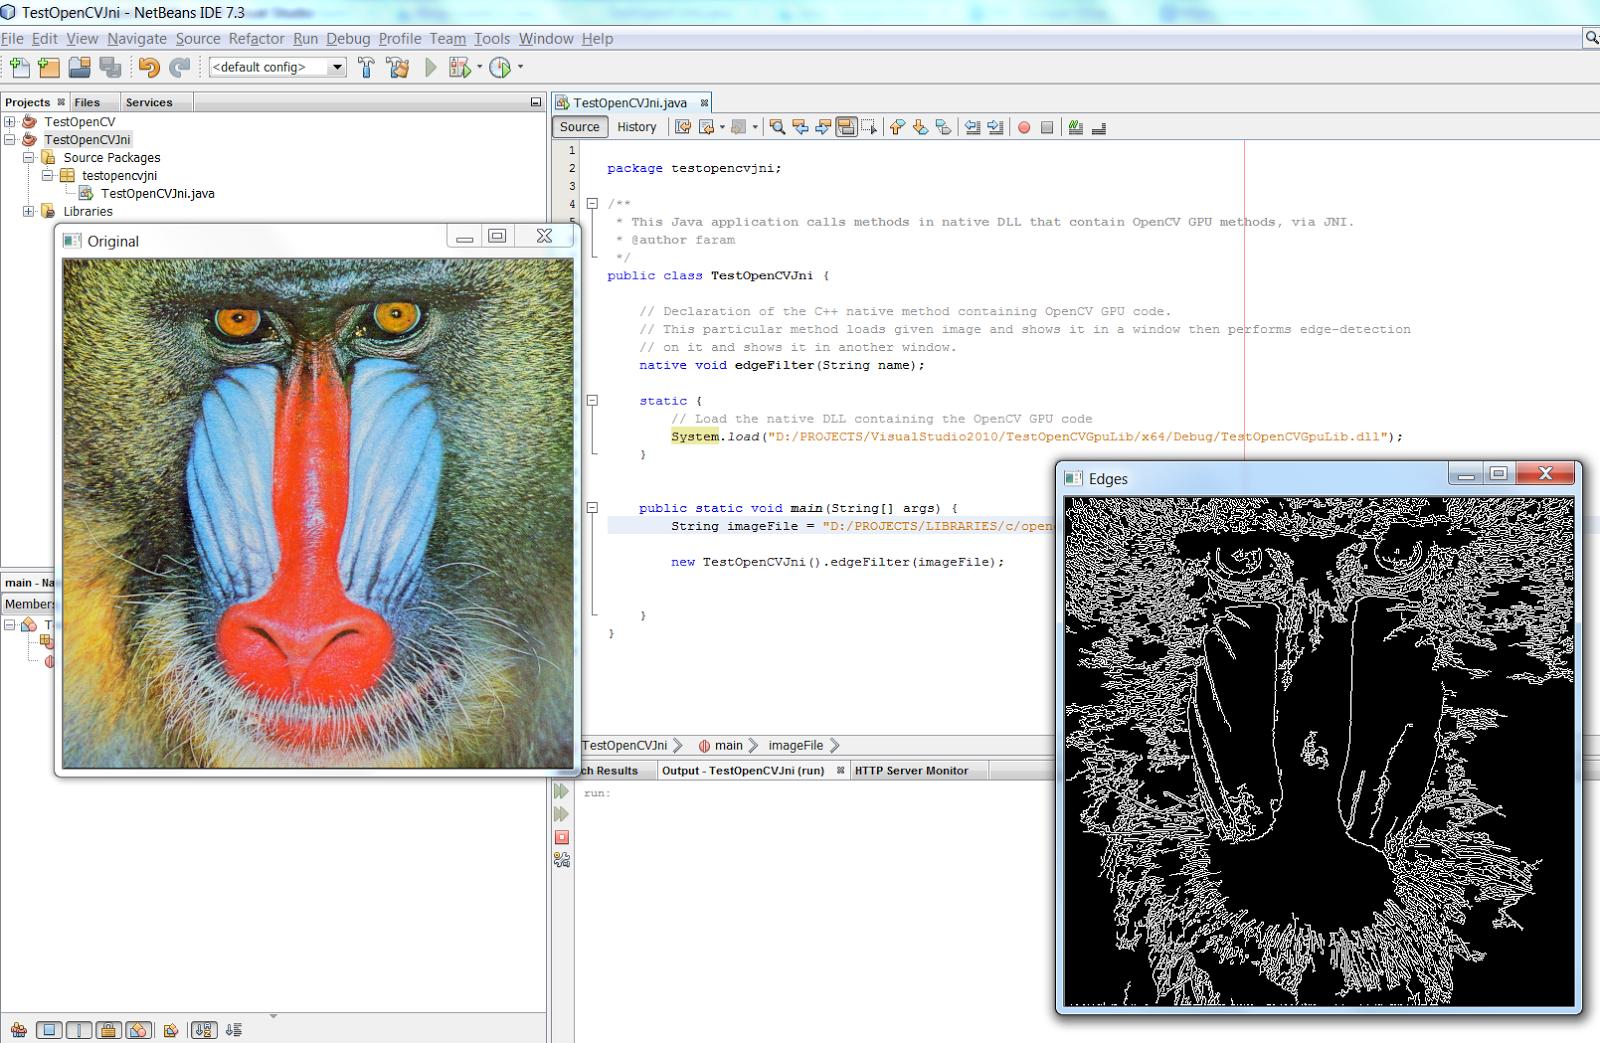 Faram's Website: Building OpenCV 2 4 8 with CUDA and running GPU